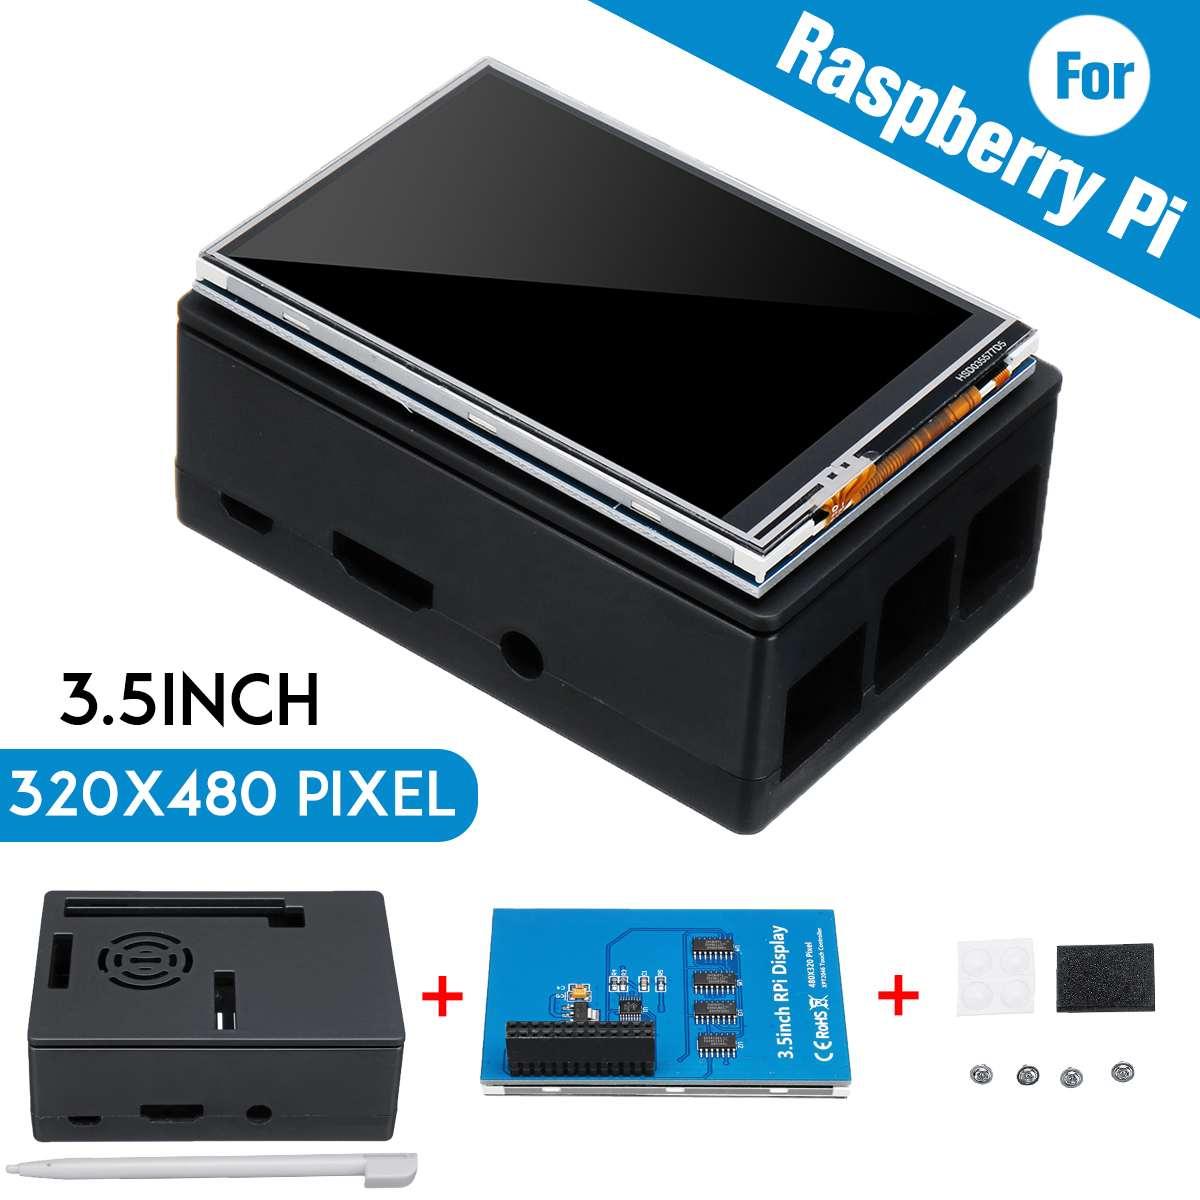 Para raspberry pi 3 cor tft tou ch tela lcd 3.5 polegada + abs caso caneta de toque display lcd monitor conjunto para raspberry pi